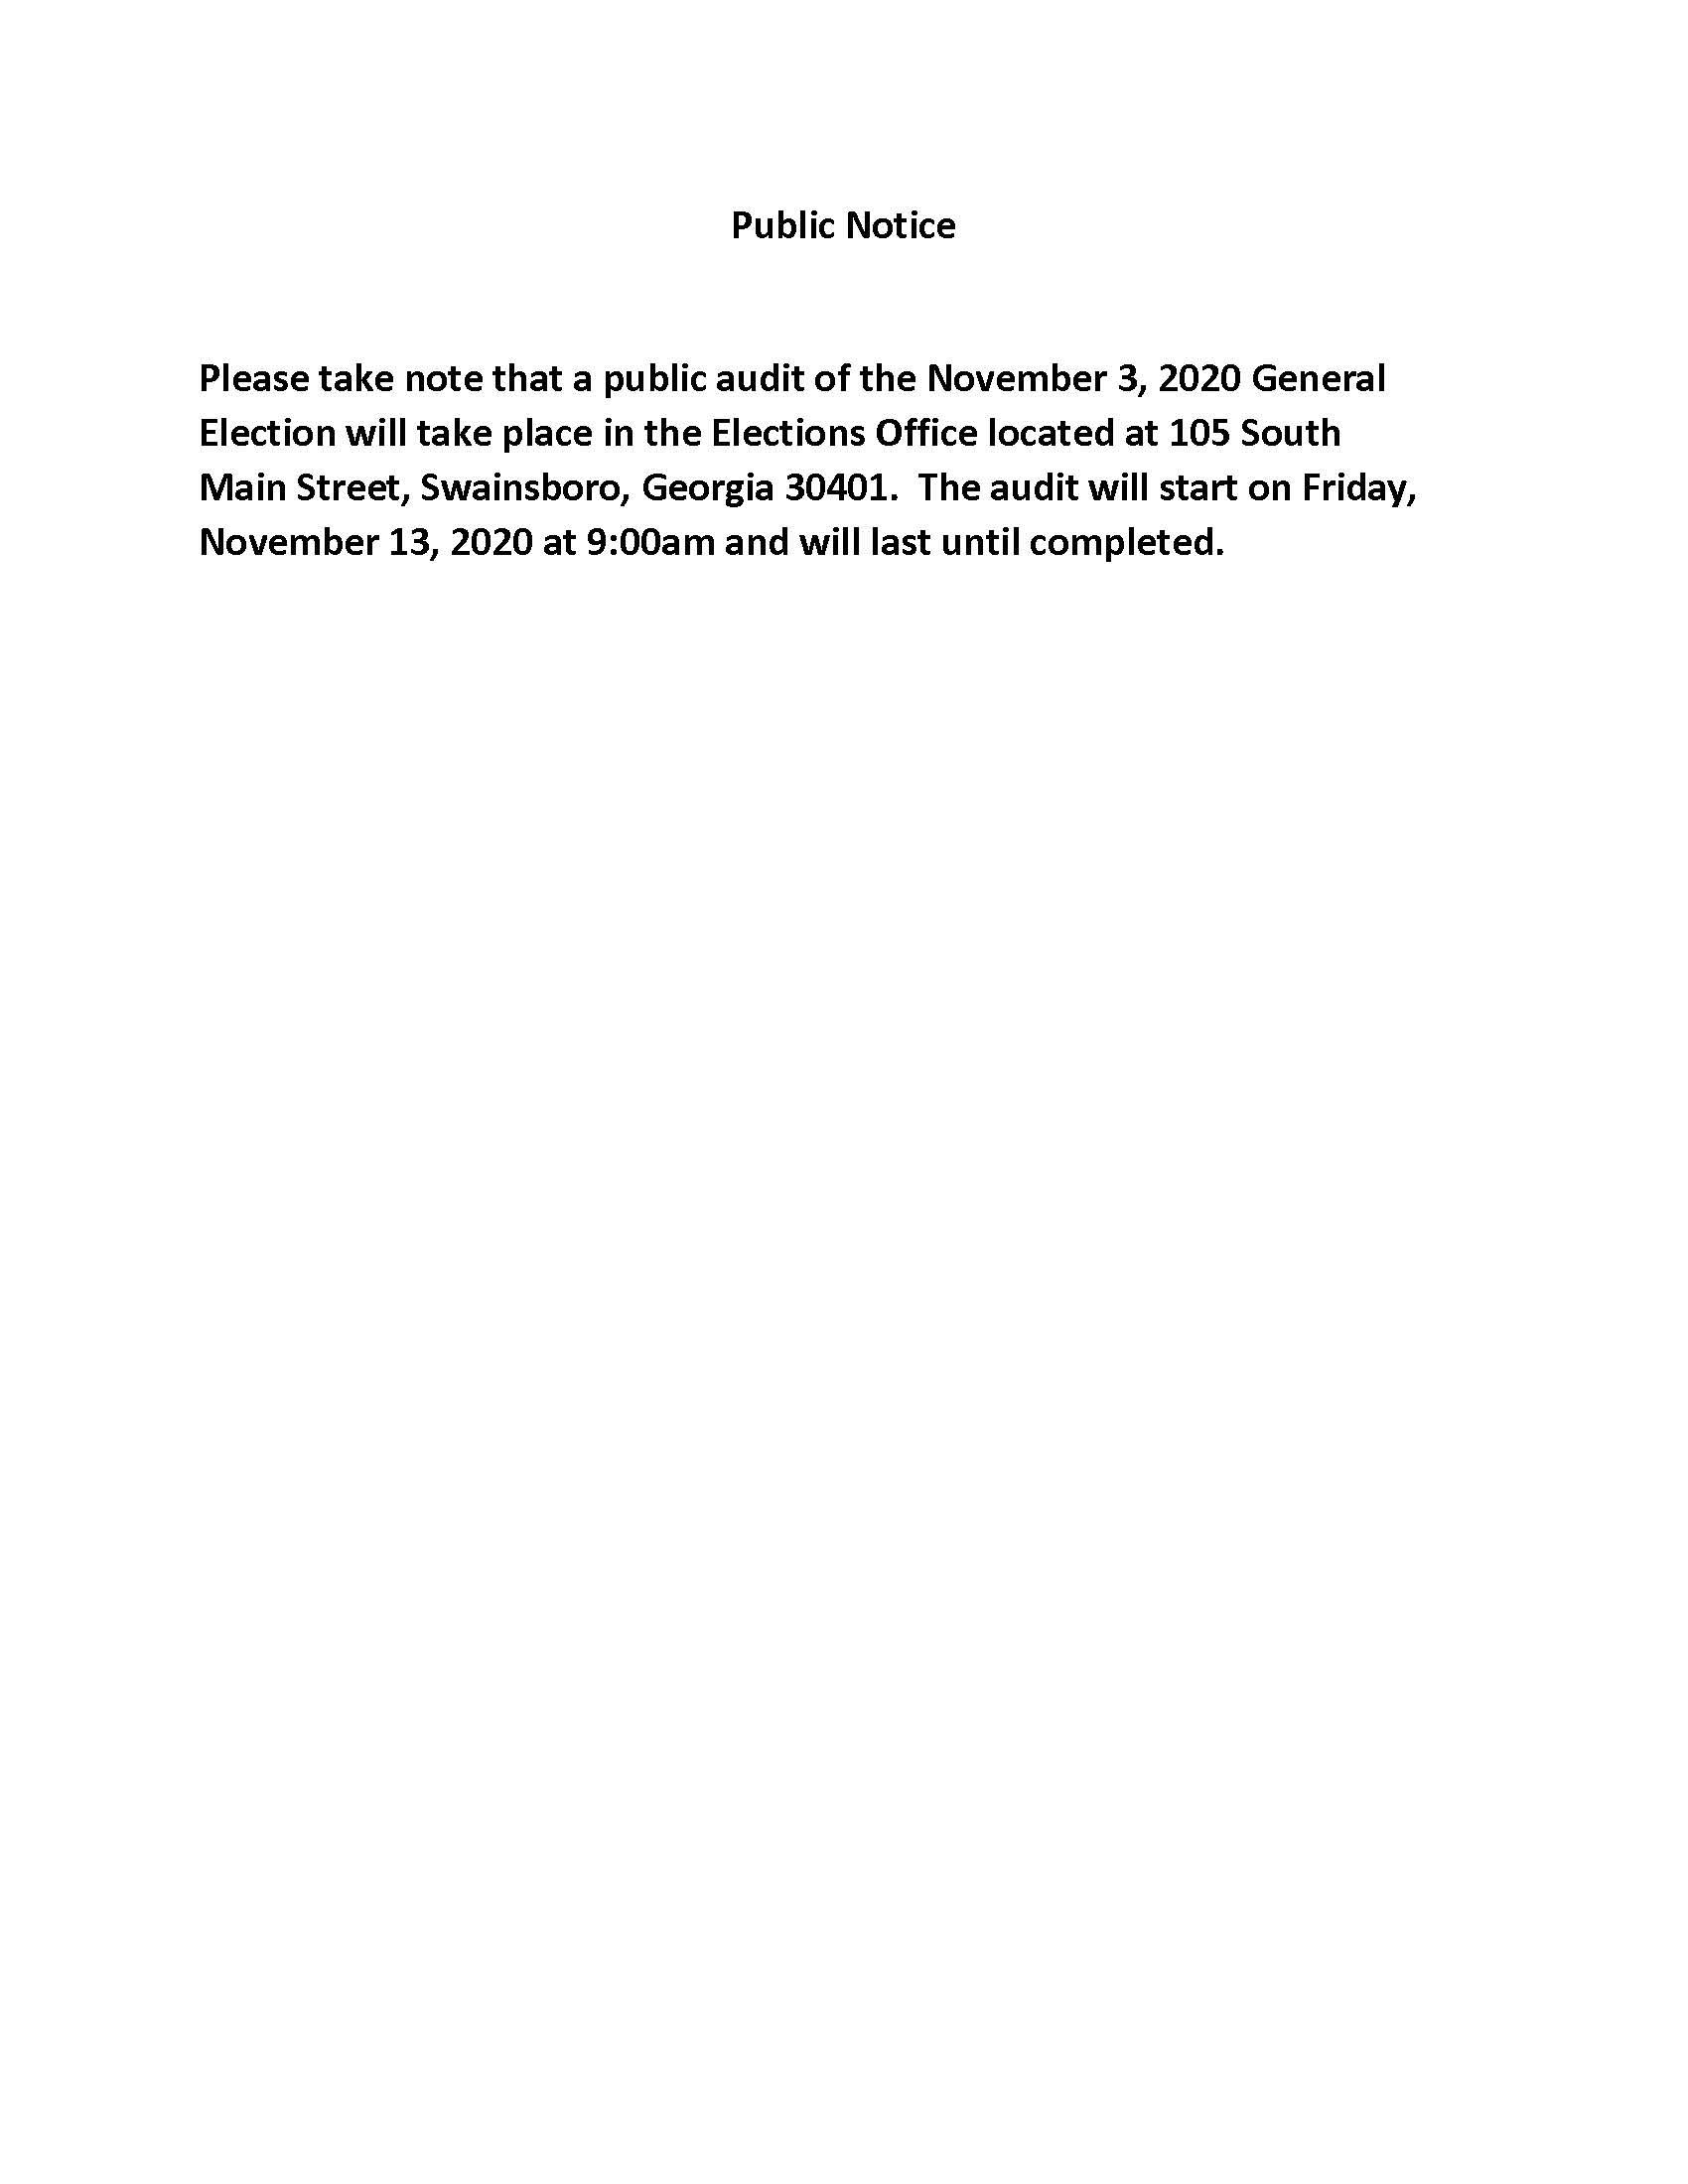 Emanuel County Ga Official Website